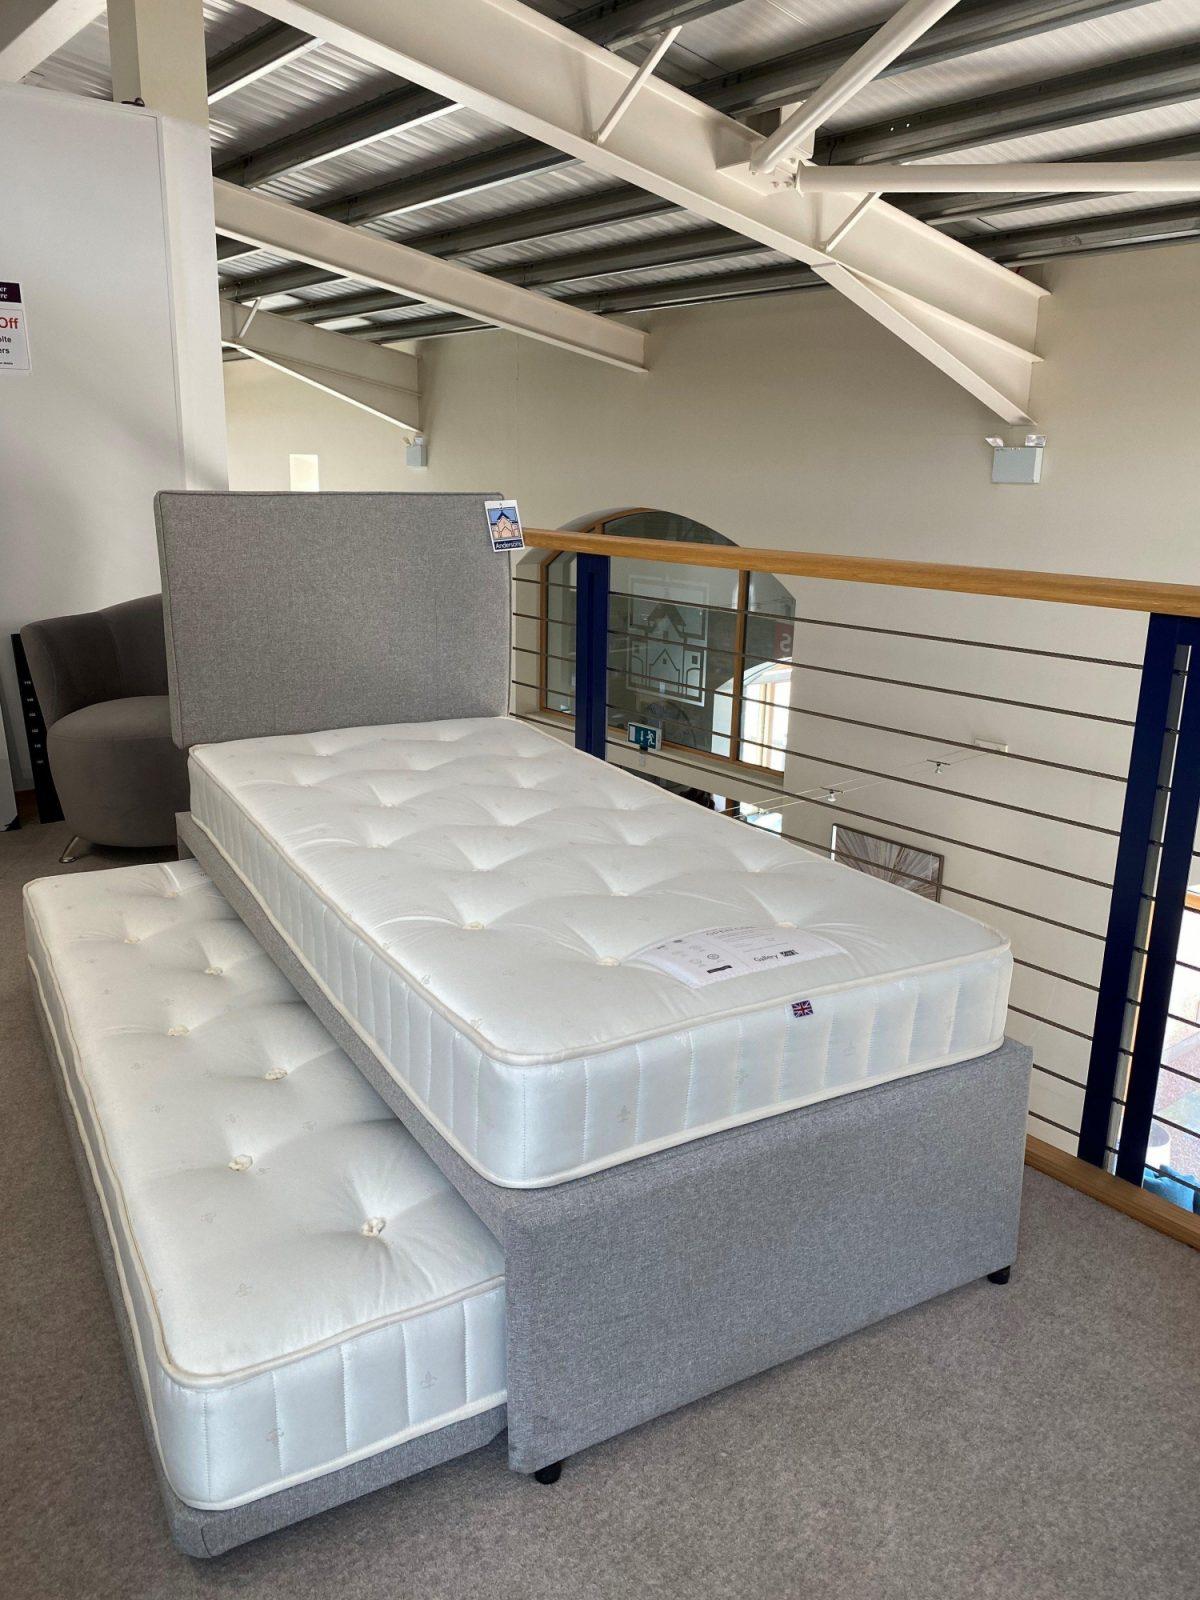 Upholstered Guest Bed Full Side